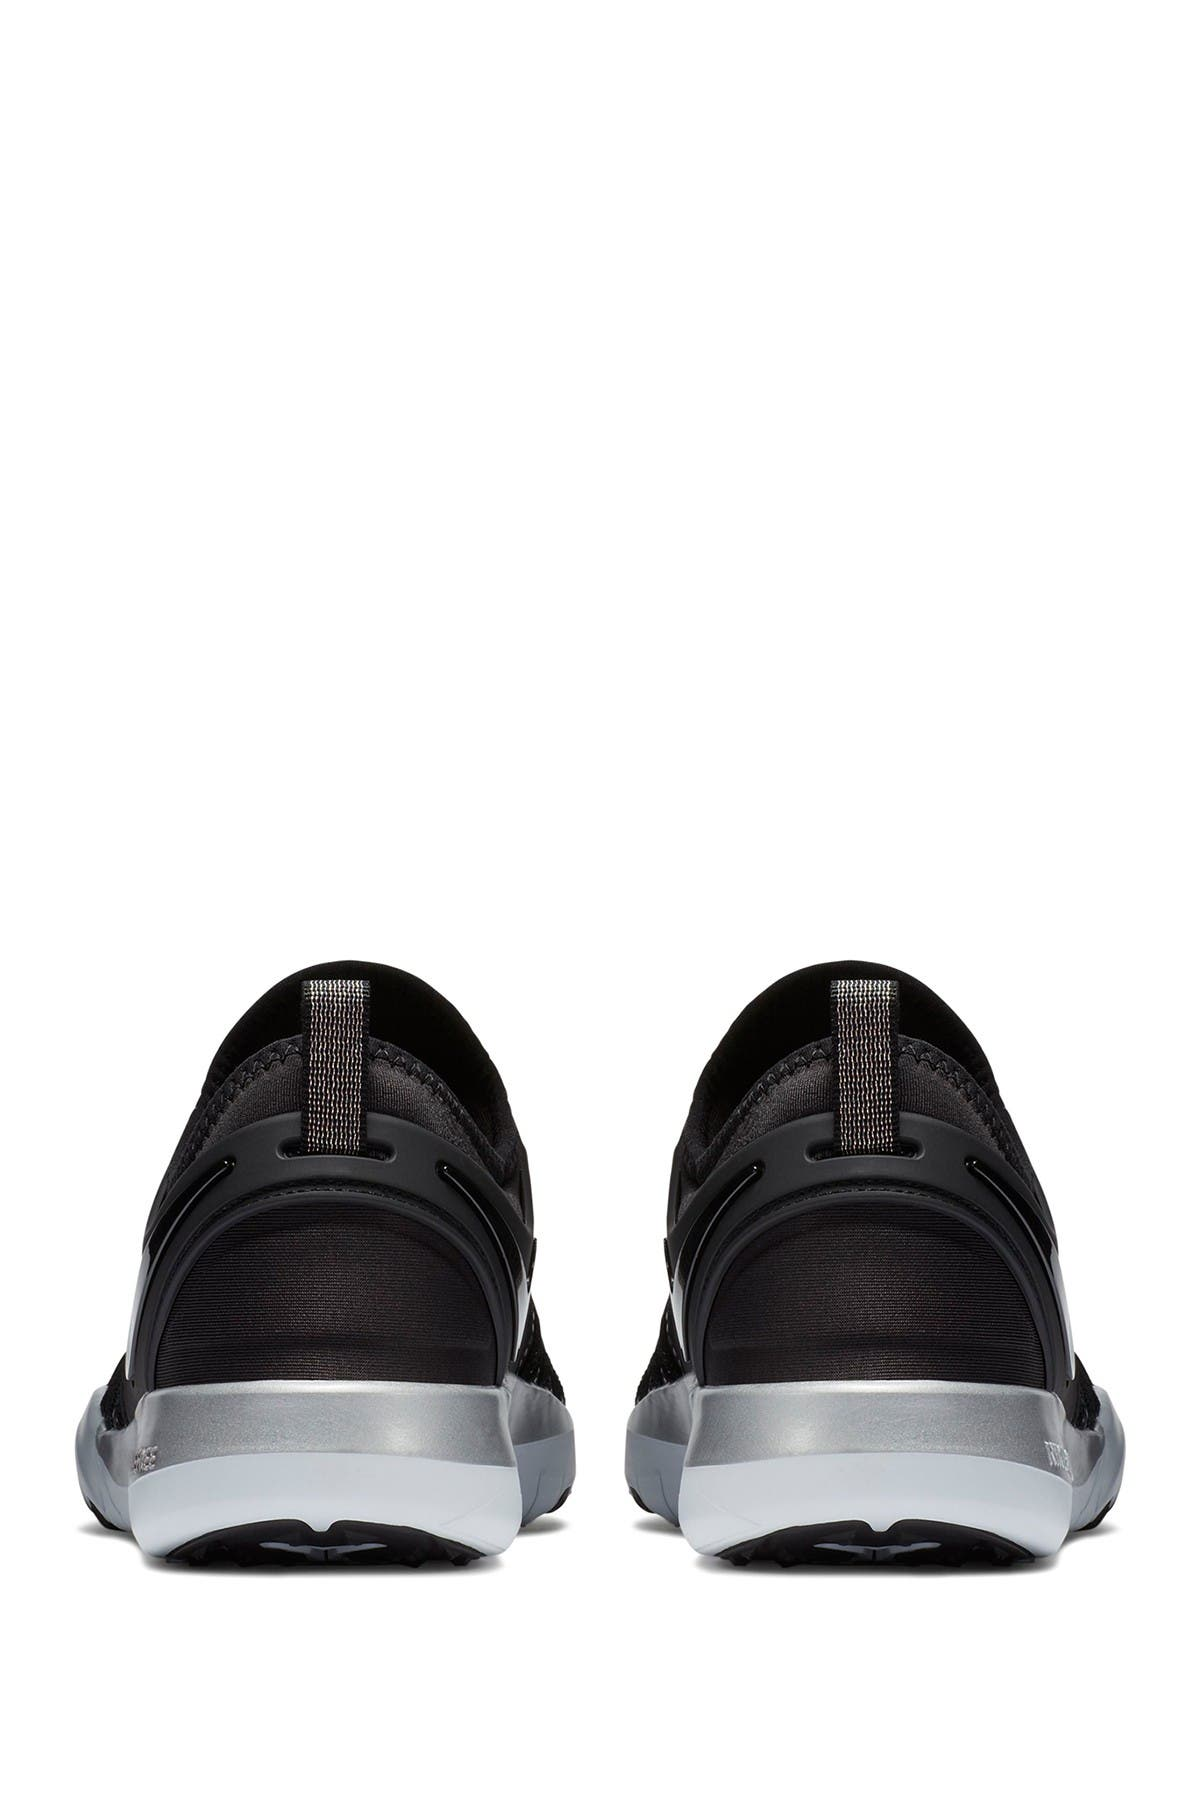 Nike | Free TR 7 MTLC Training Sneaker